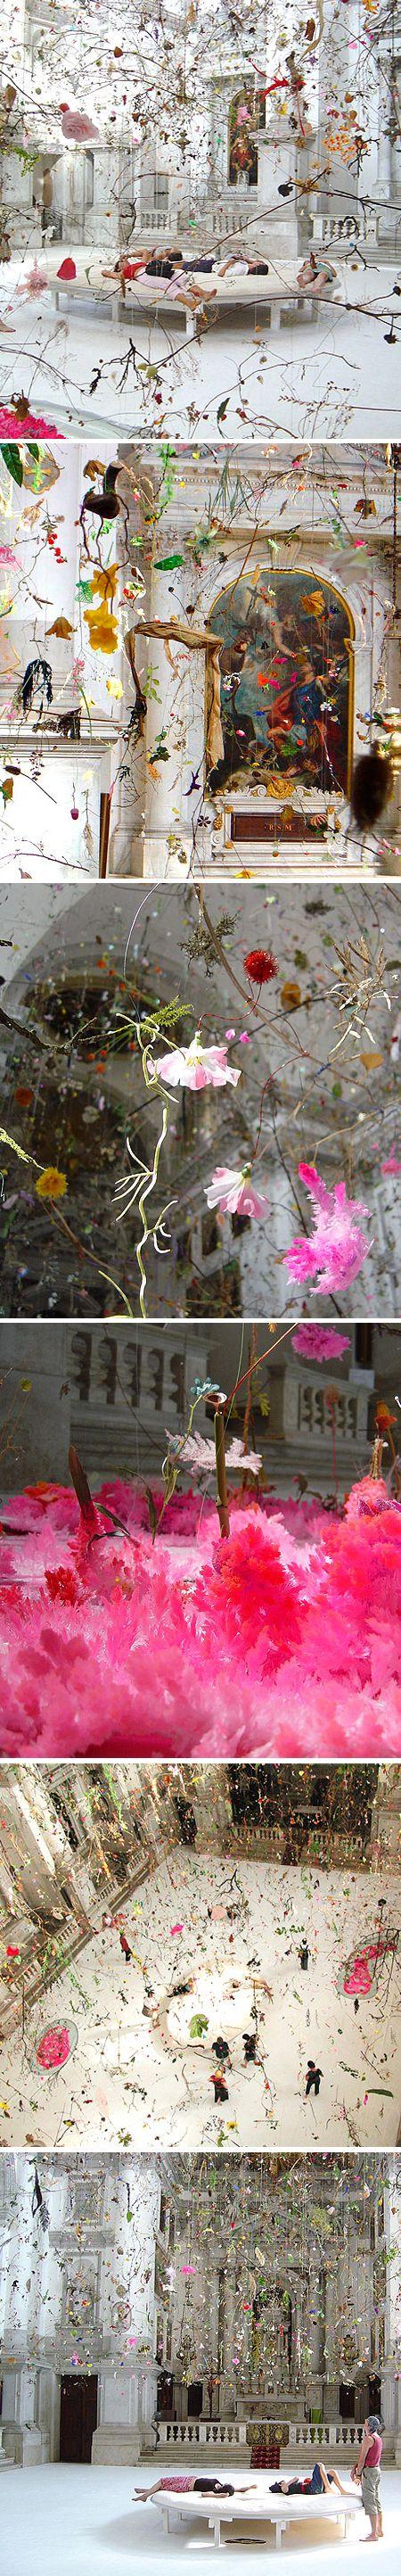 Falling Garden installation by Gerda Steiner and Jörg Lenzlinger